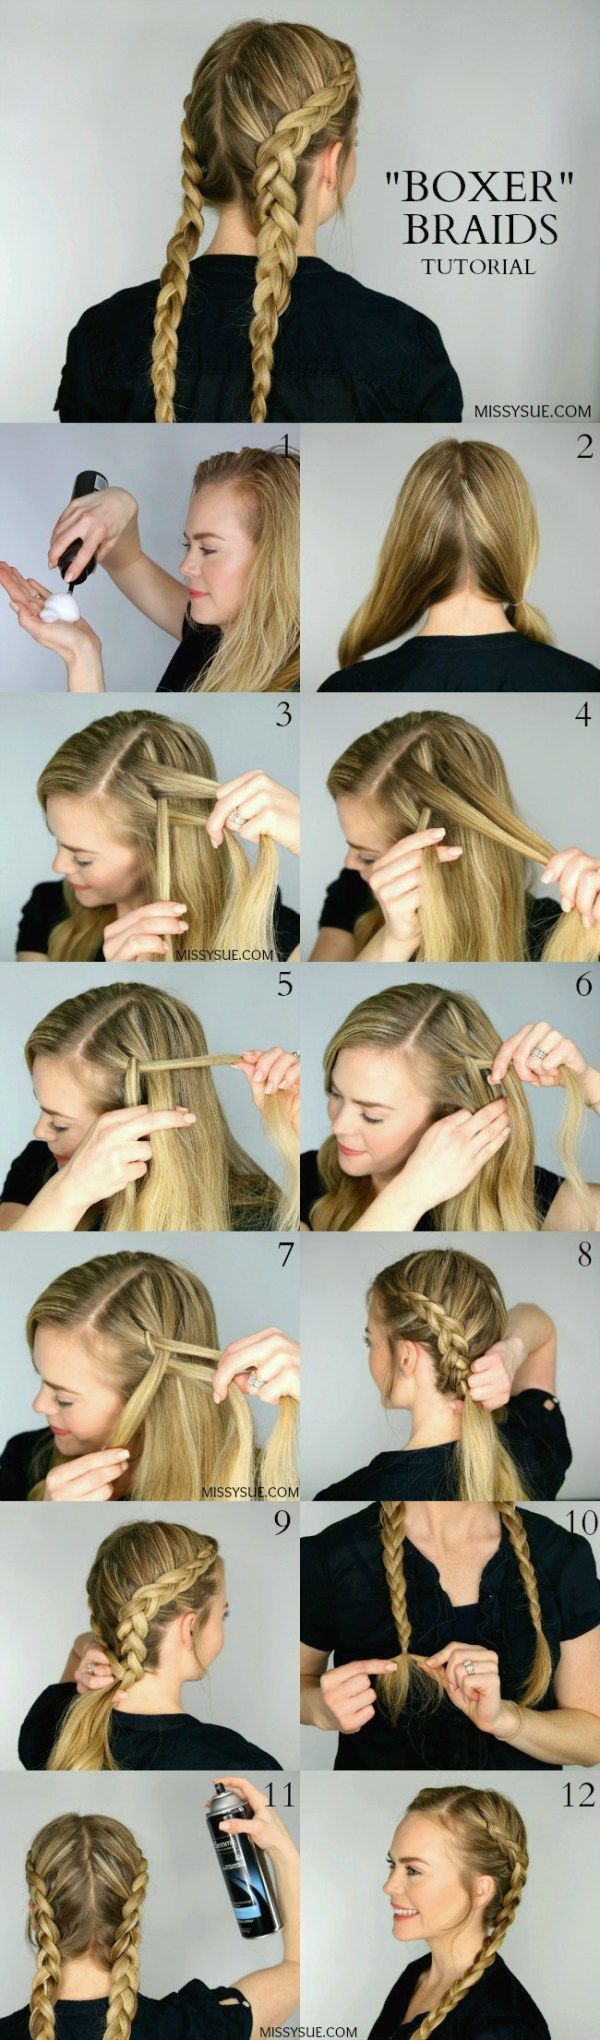 cool Dutch Boxer Braids | Missy Sue by http://www.dana-haircuts.xyz/hair-tutorials/dutch-boxer-braids-missy-sue/